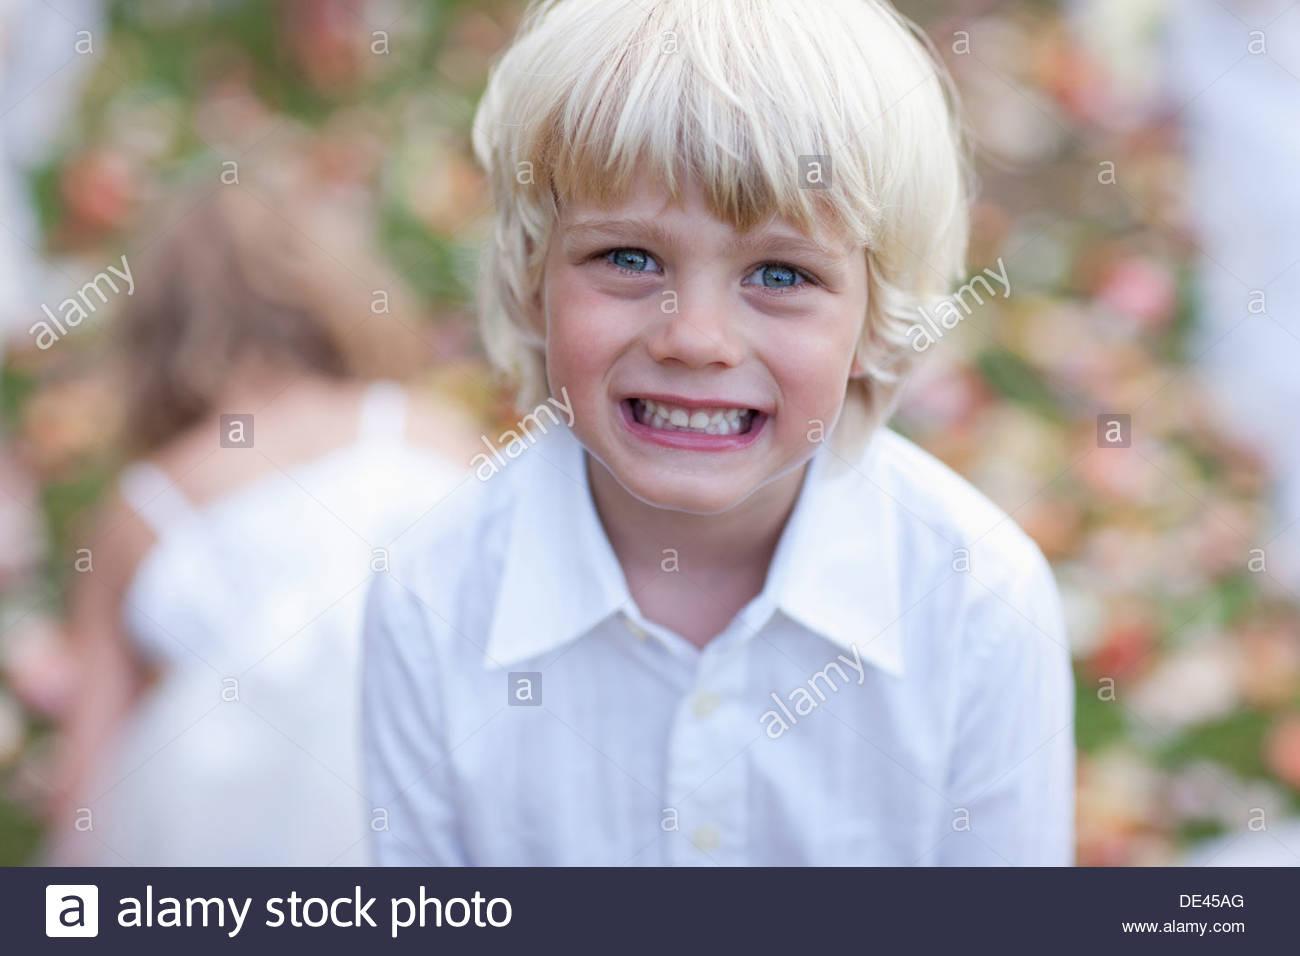 Boy at wedding reception - Stock Image